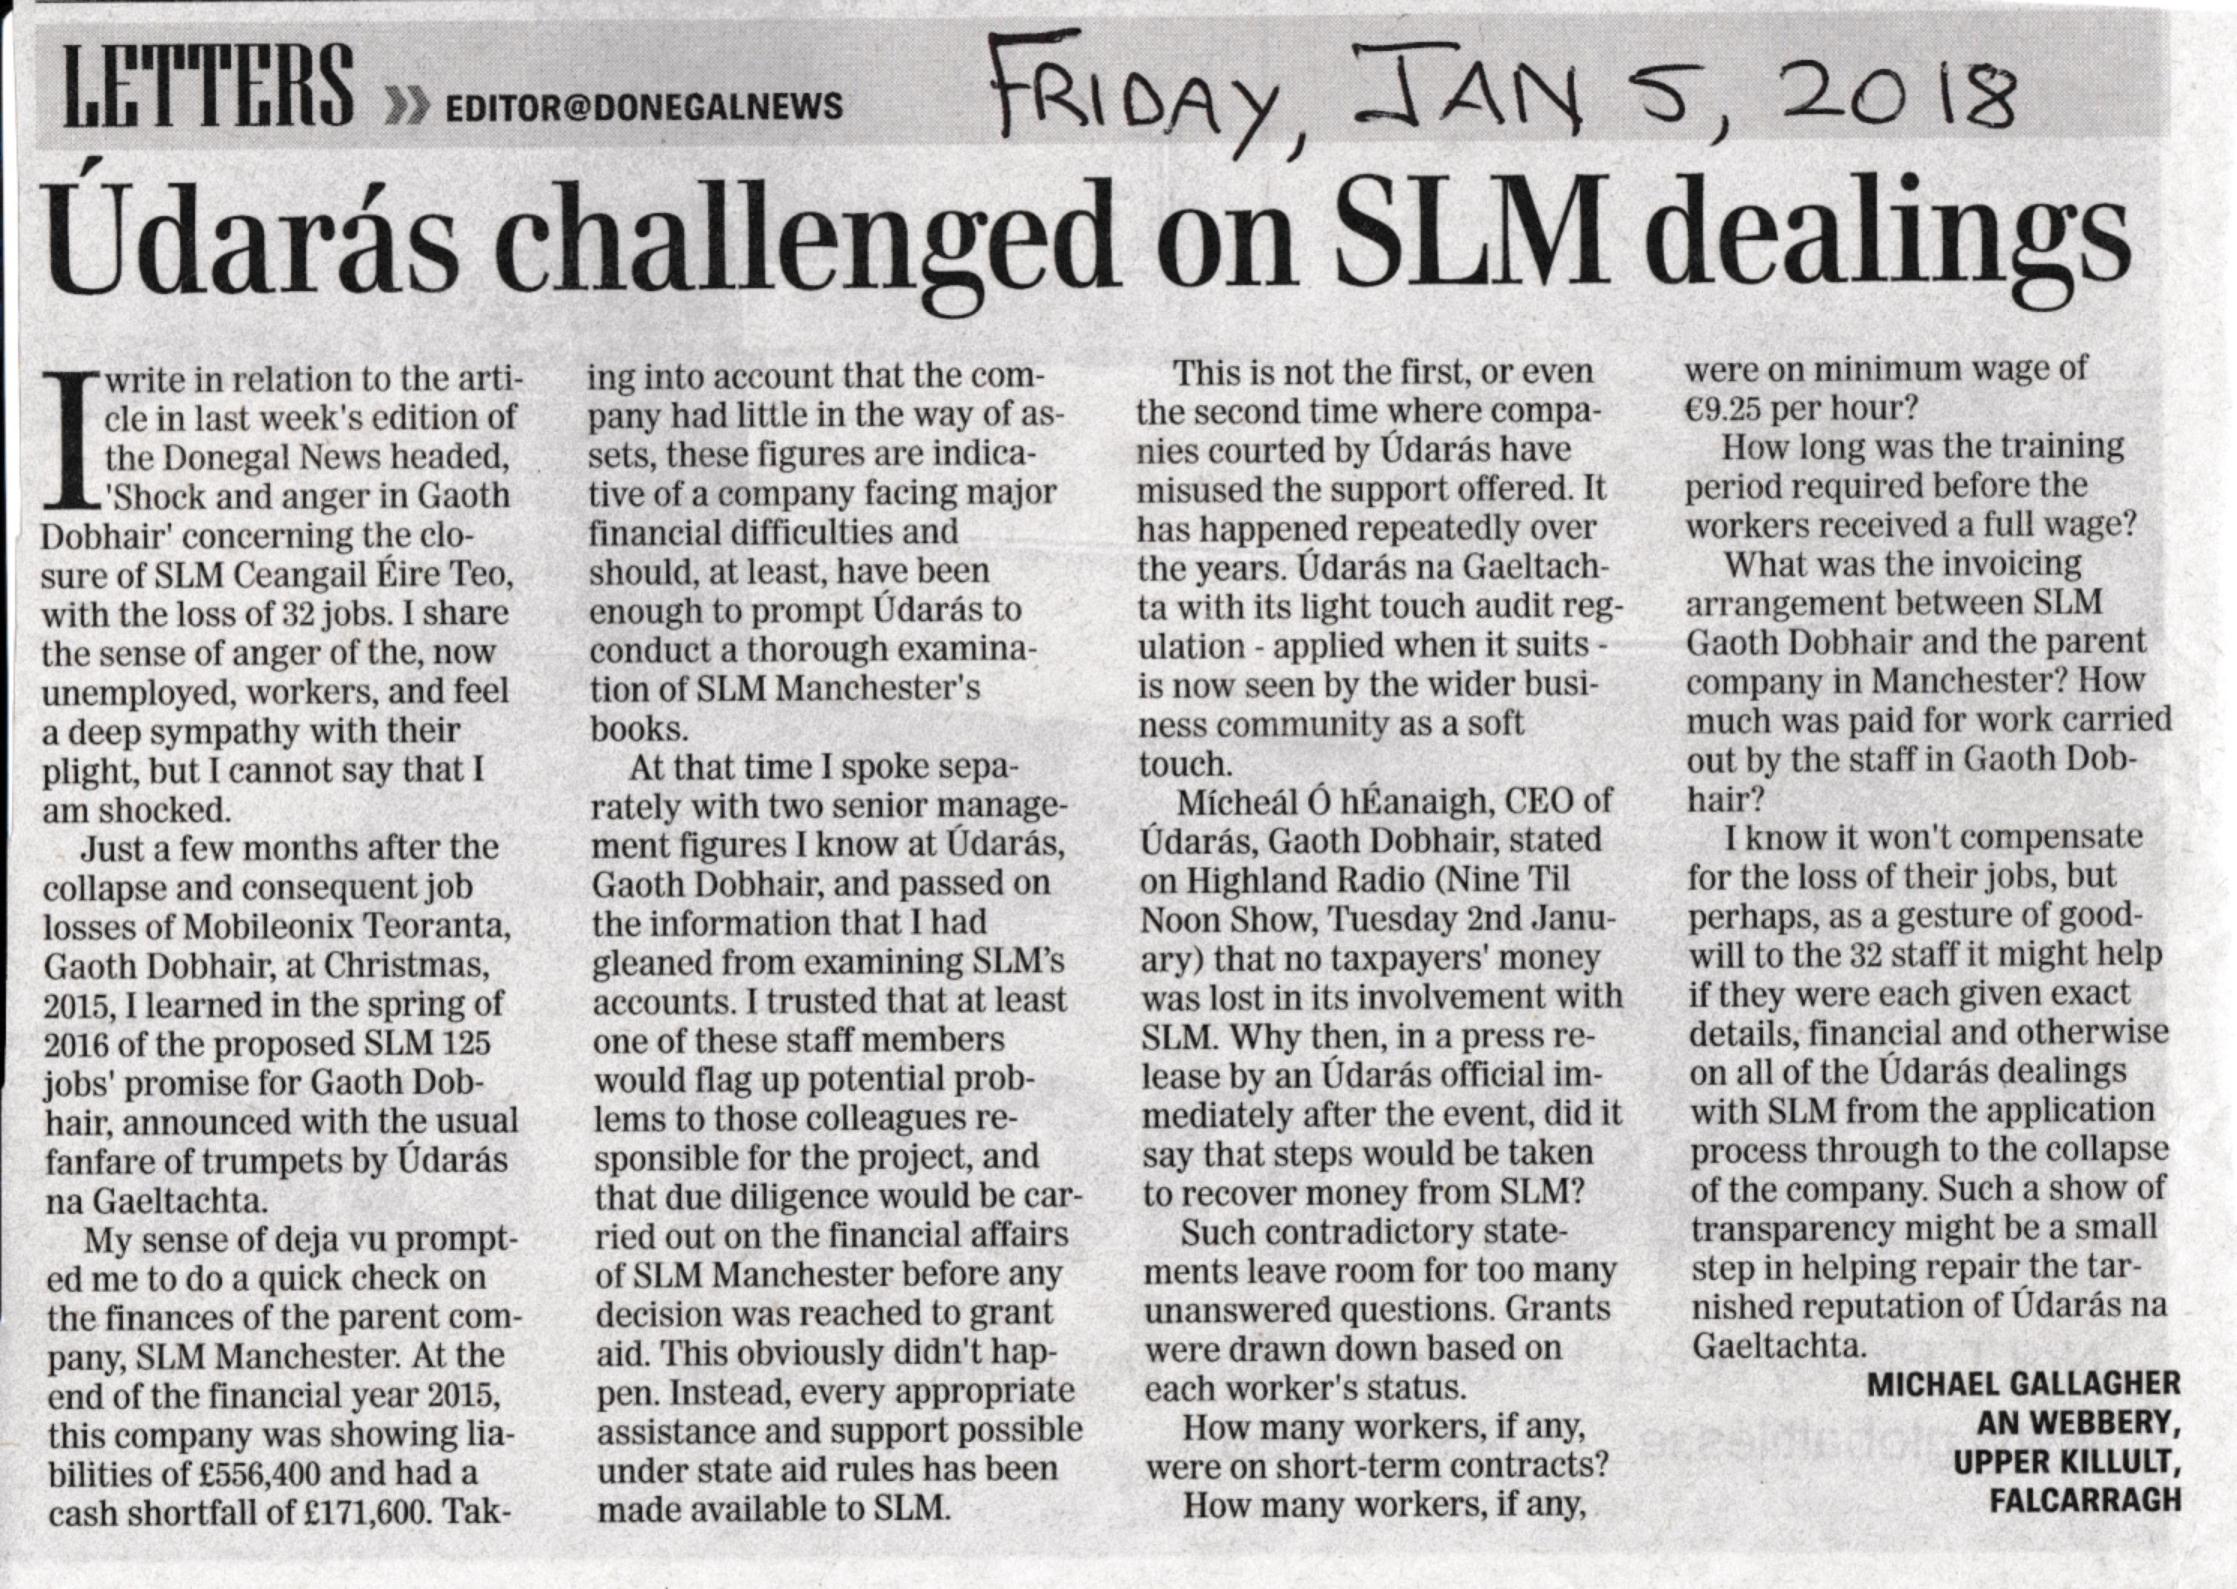 Michael Gallagher letter about SLM, Udaras and SLM